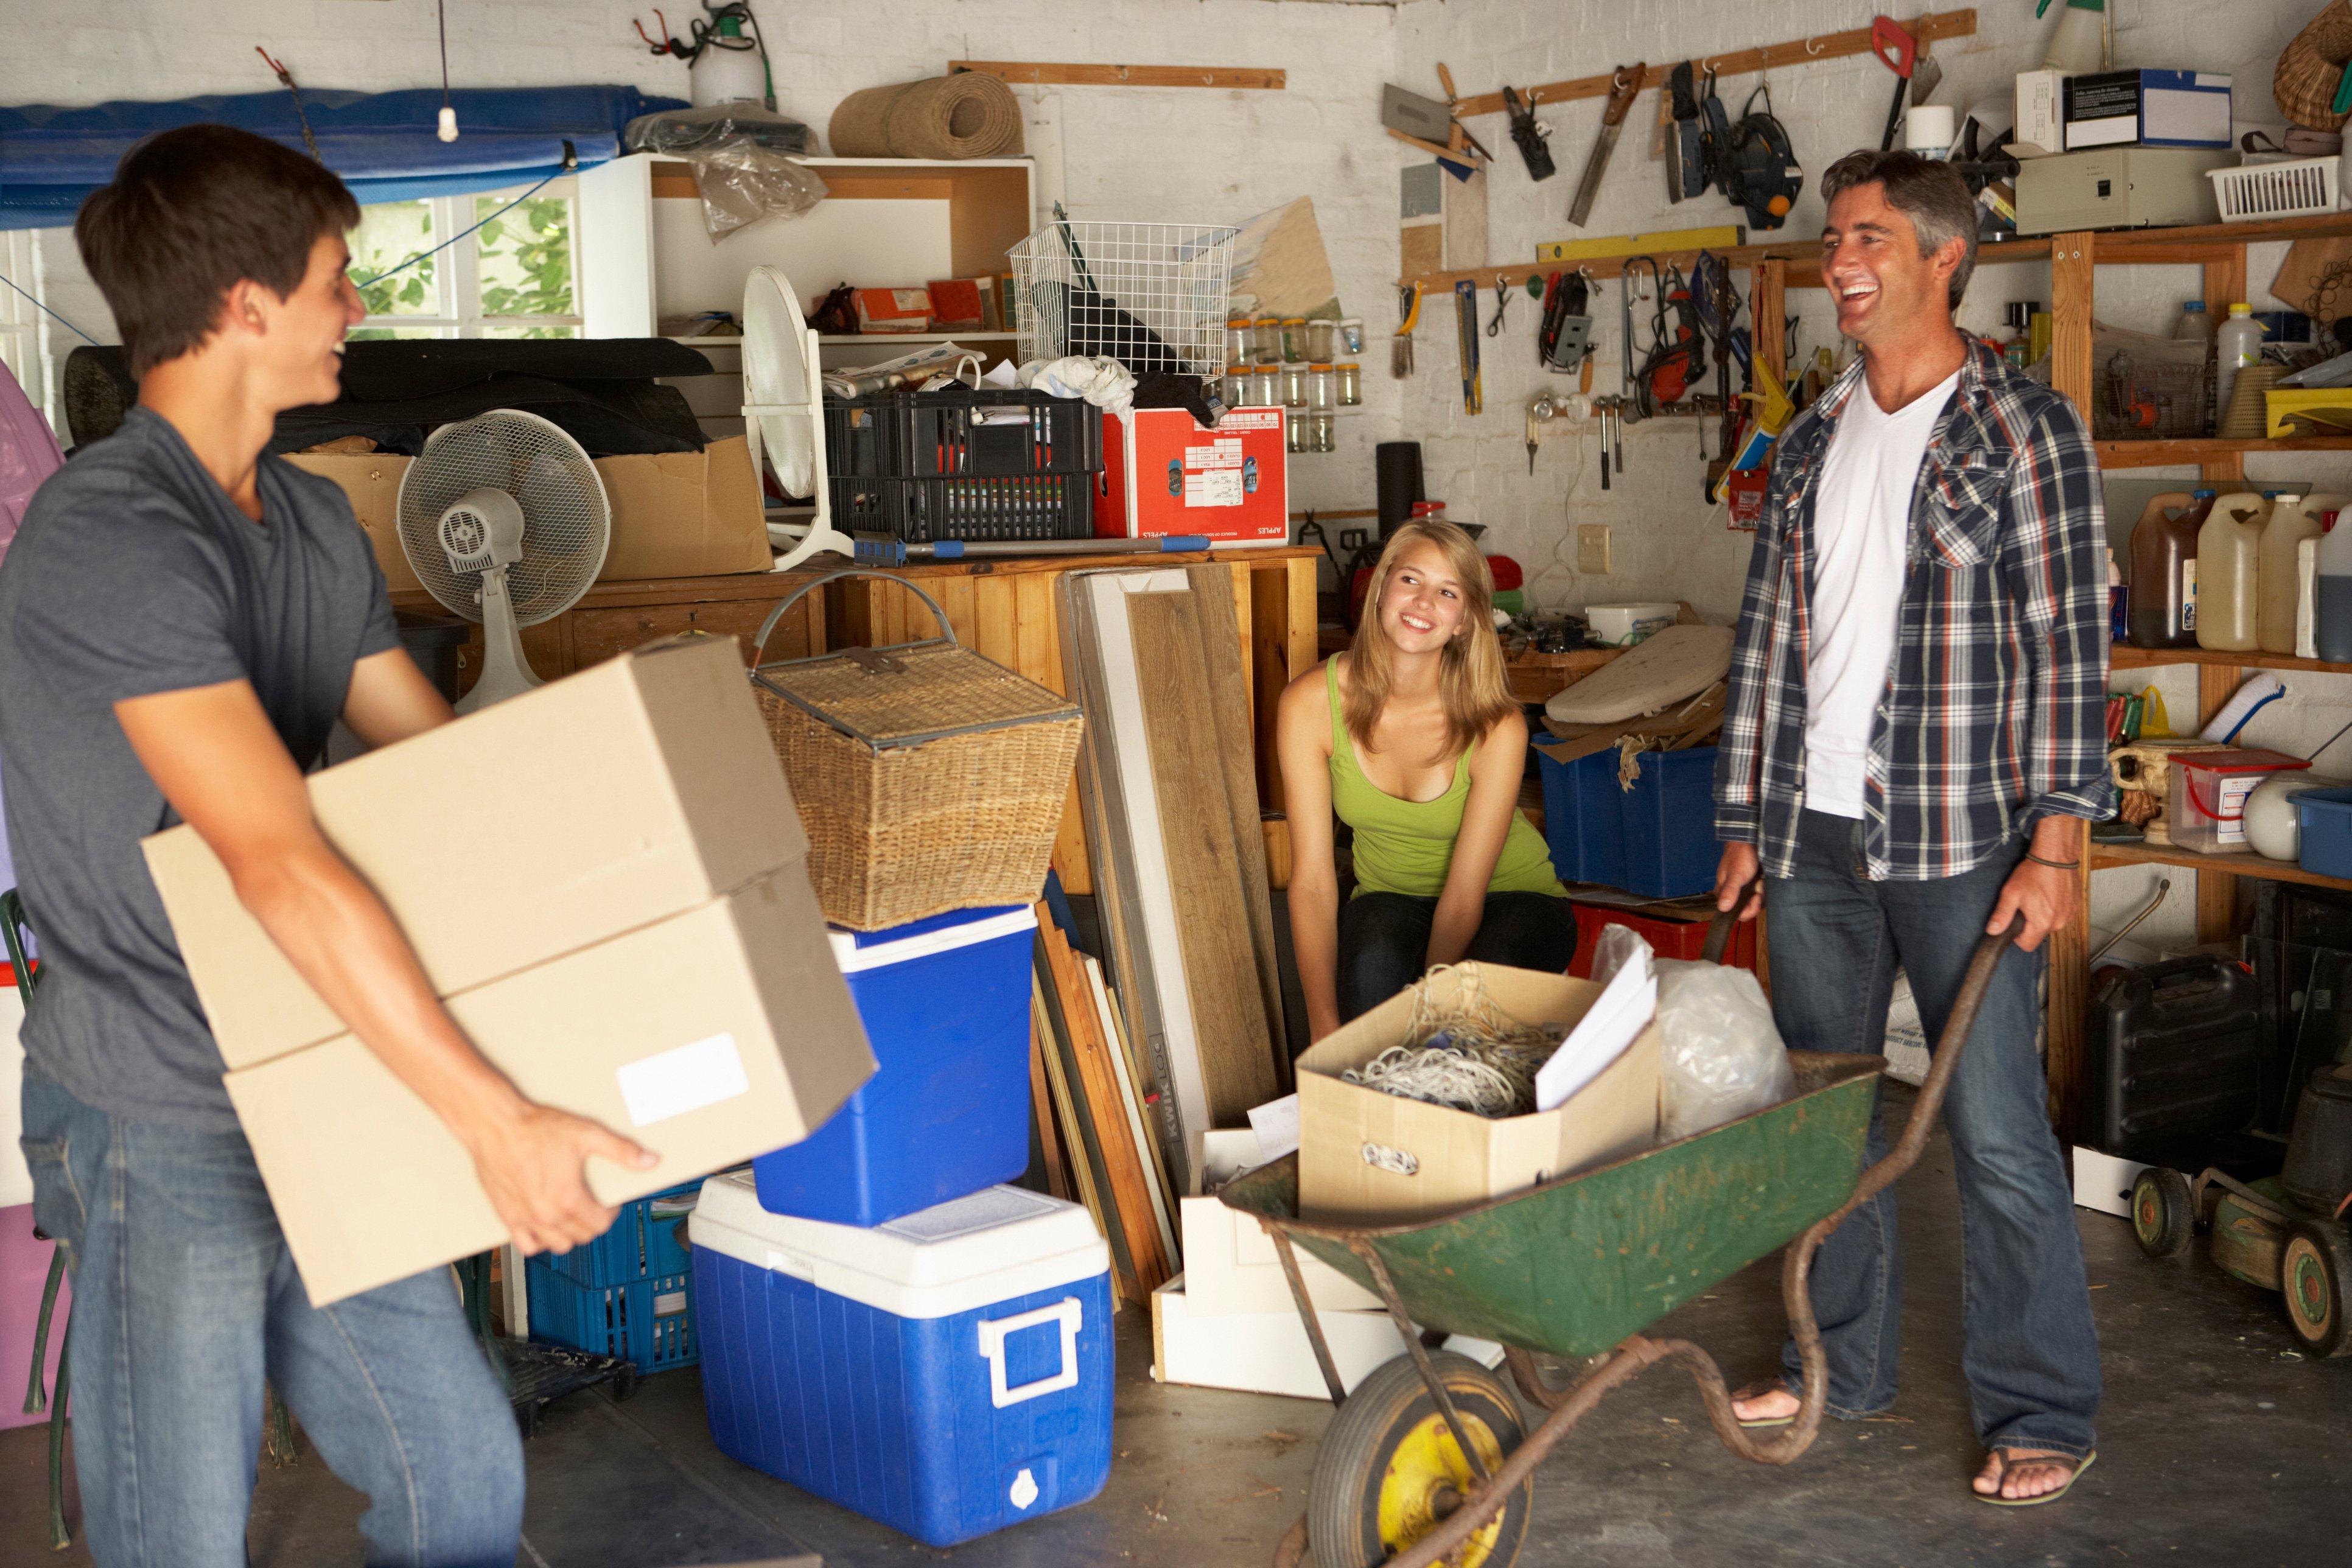 de-clutering a home garage